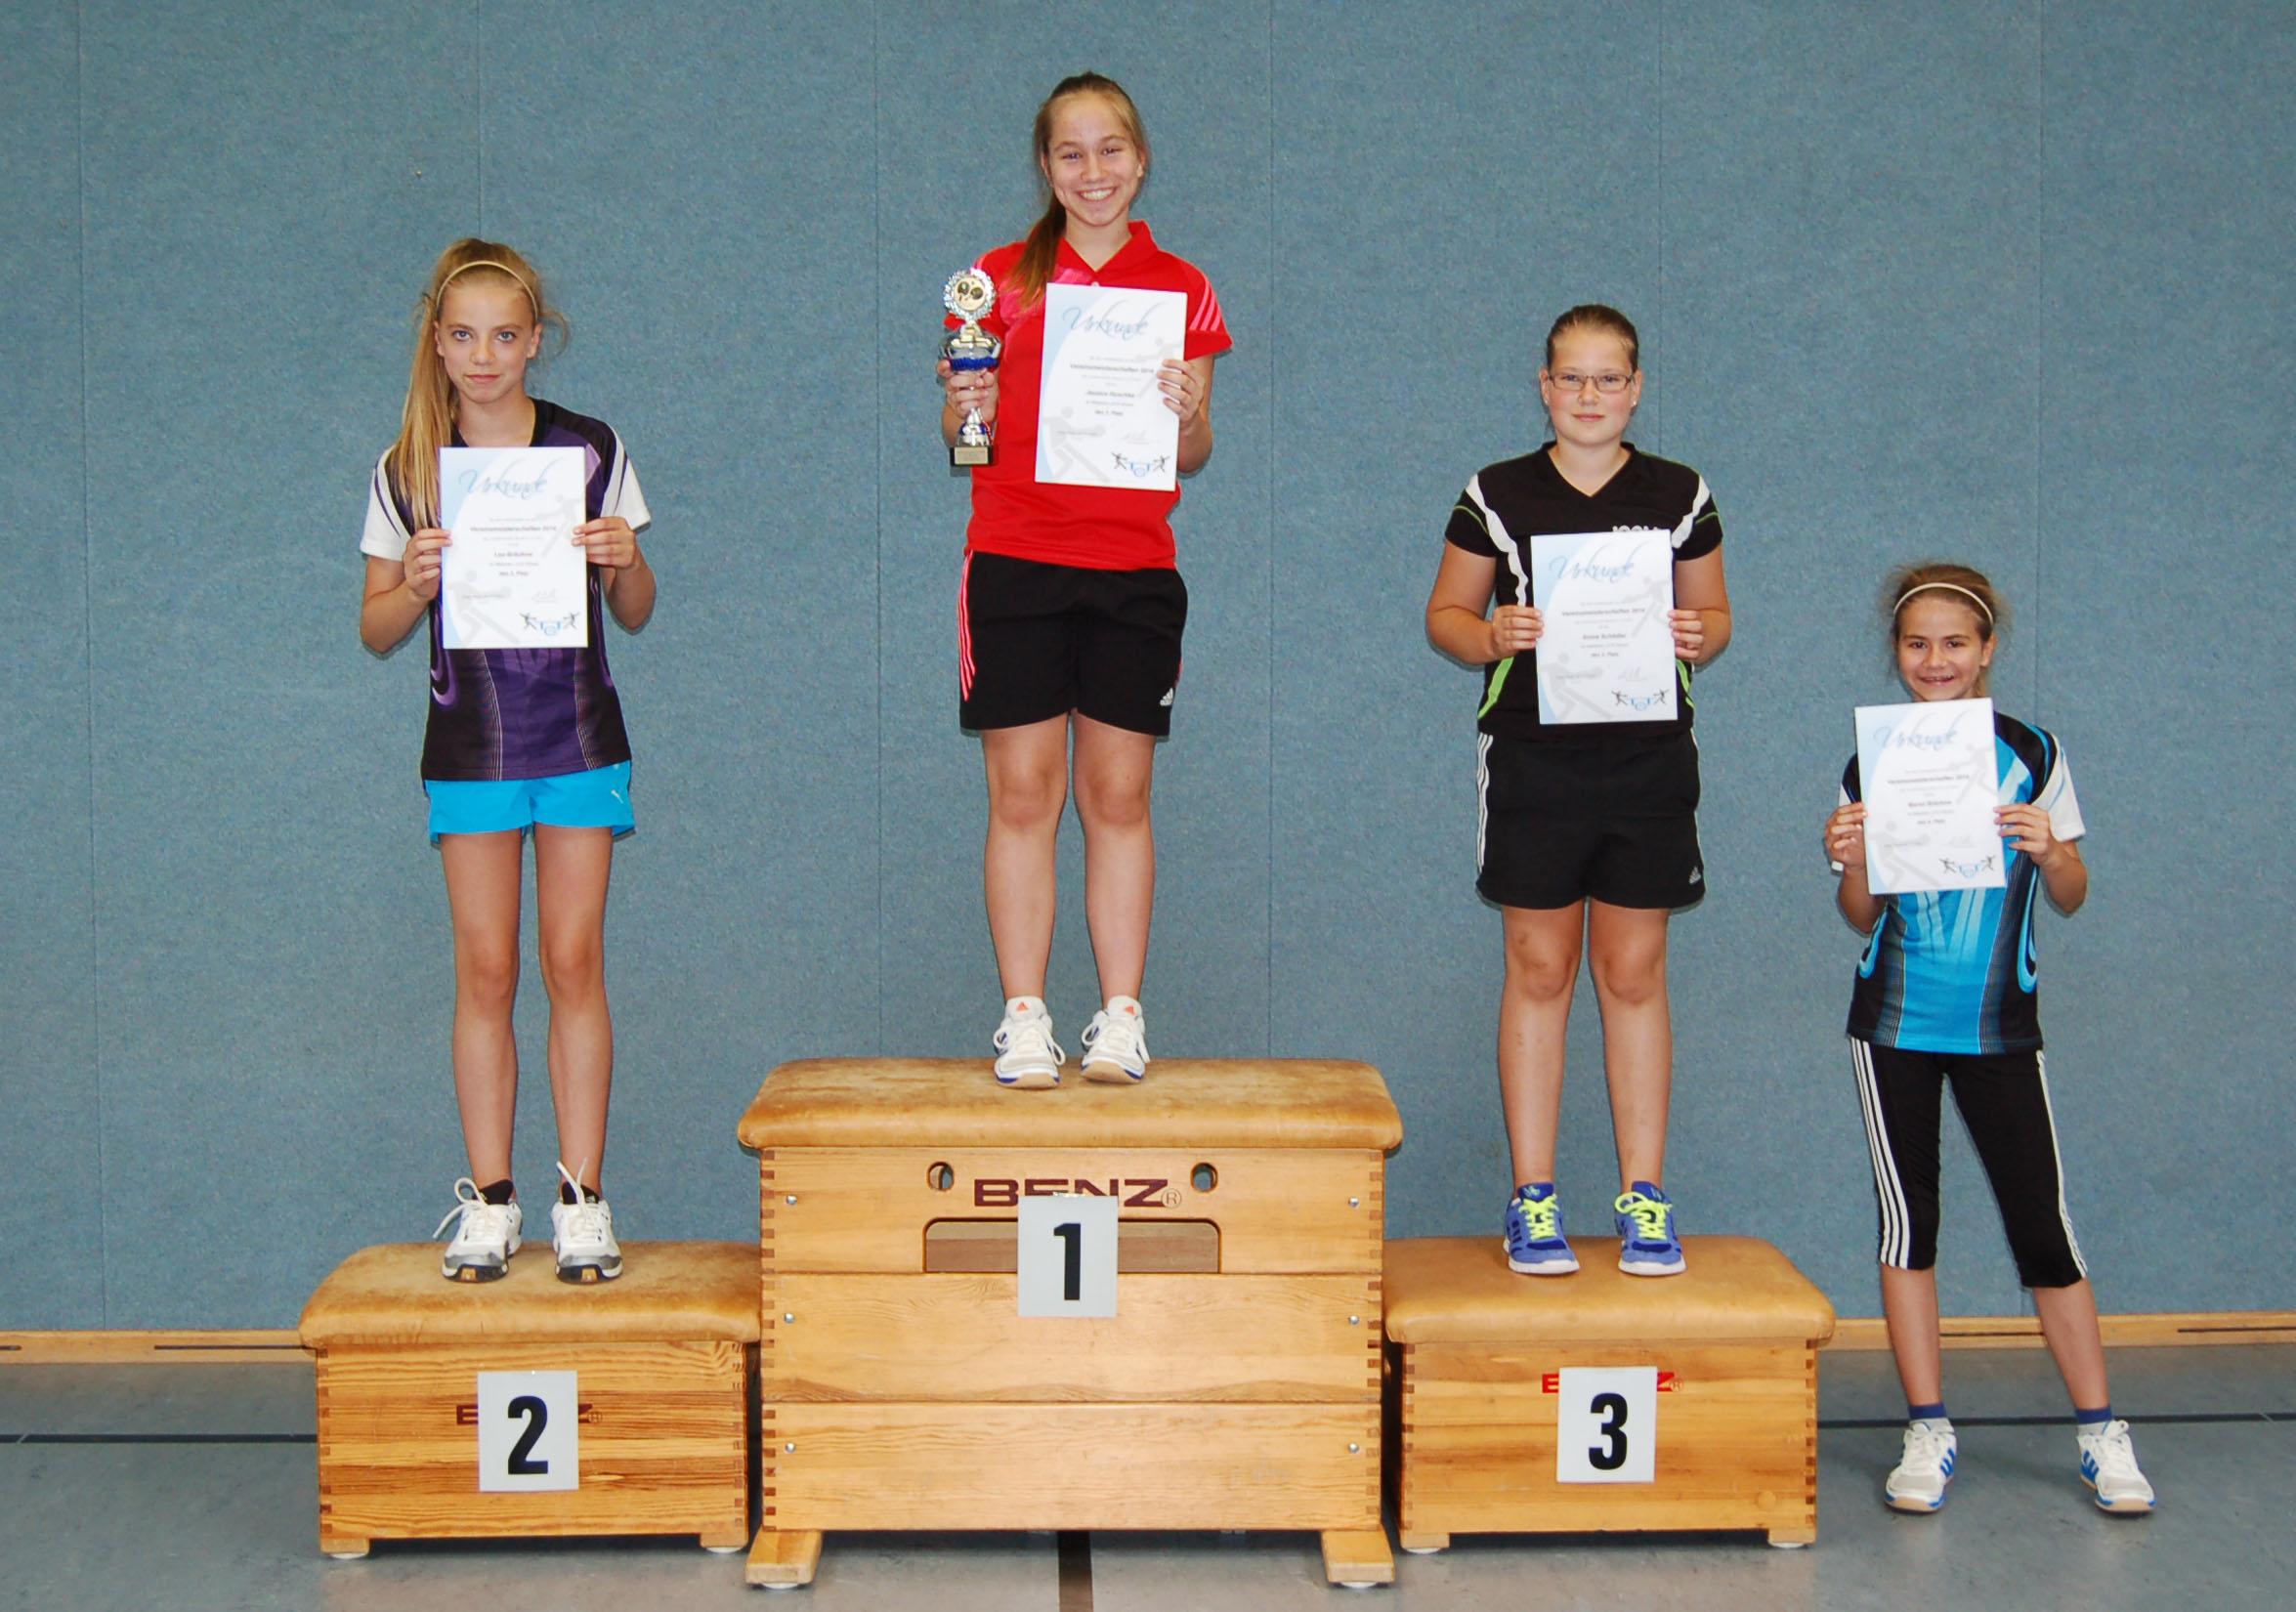 Vereinsmeisterschaft 2014 Mädchen U13